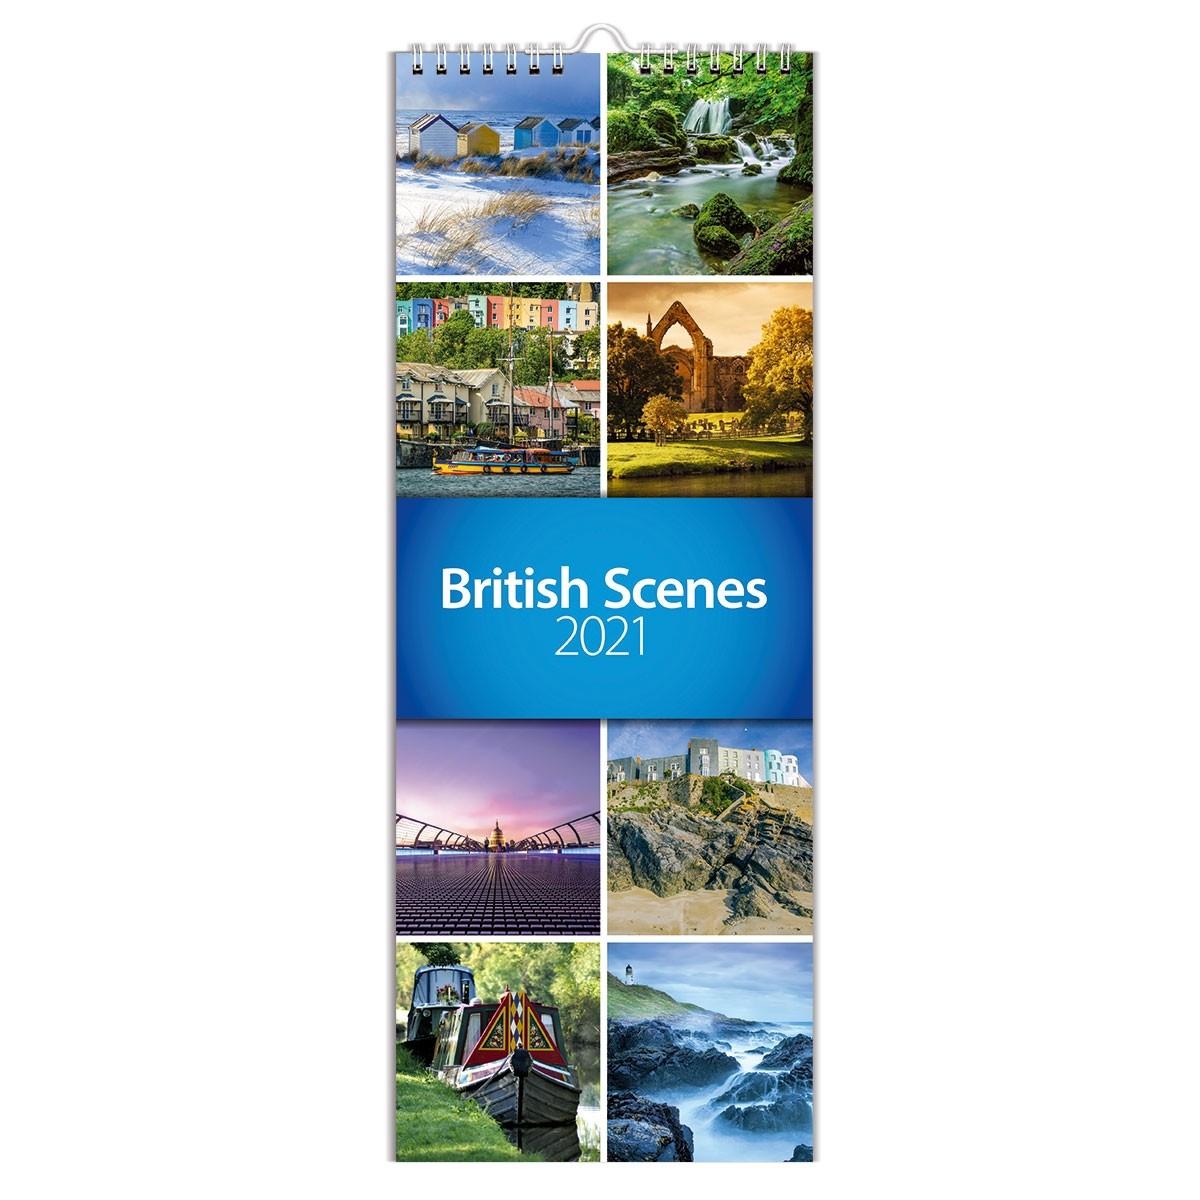 2021 British Scenes Slim Wall Calendar